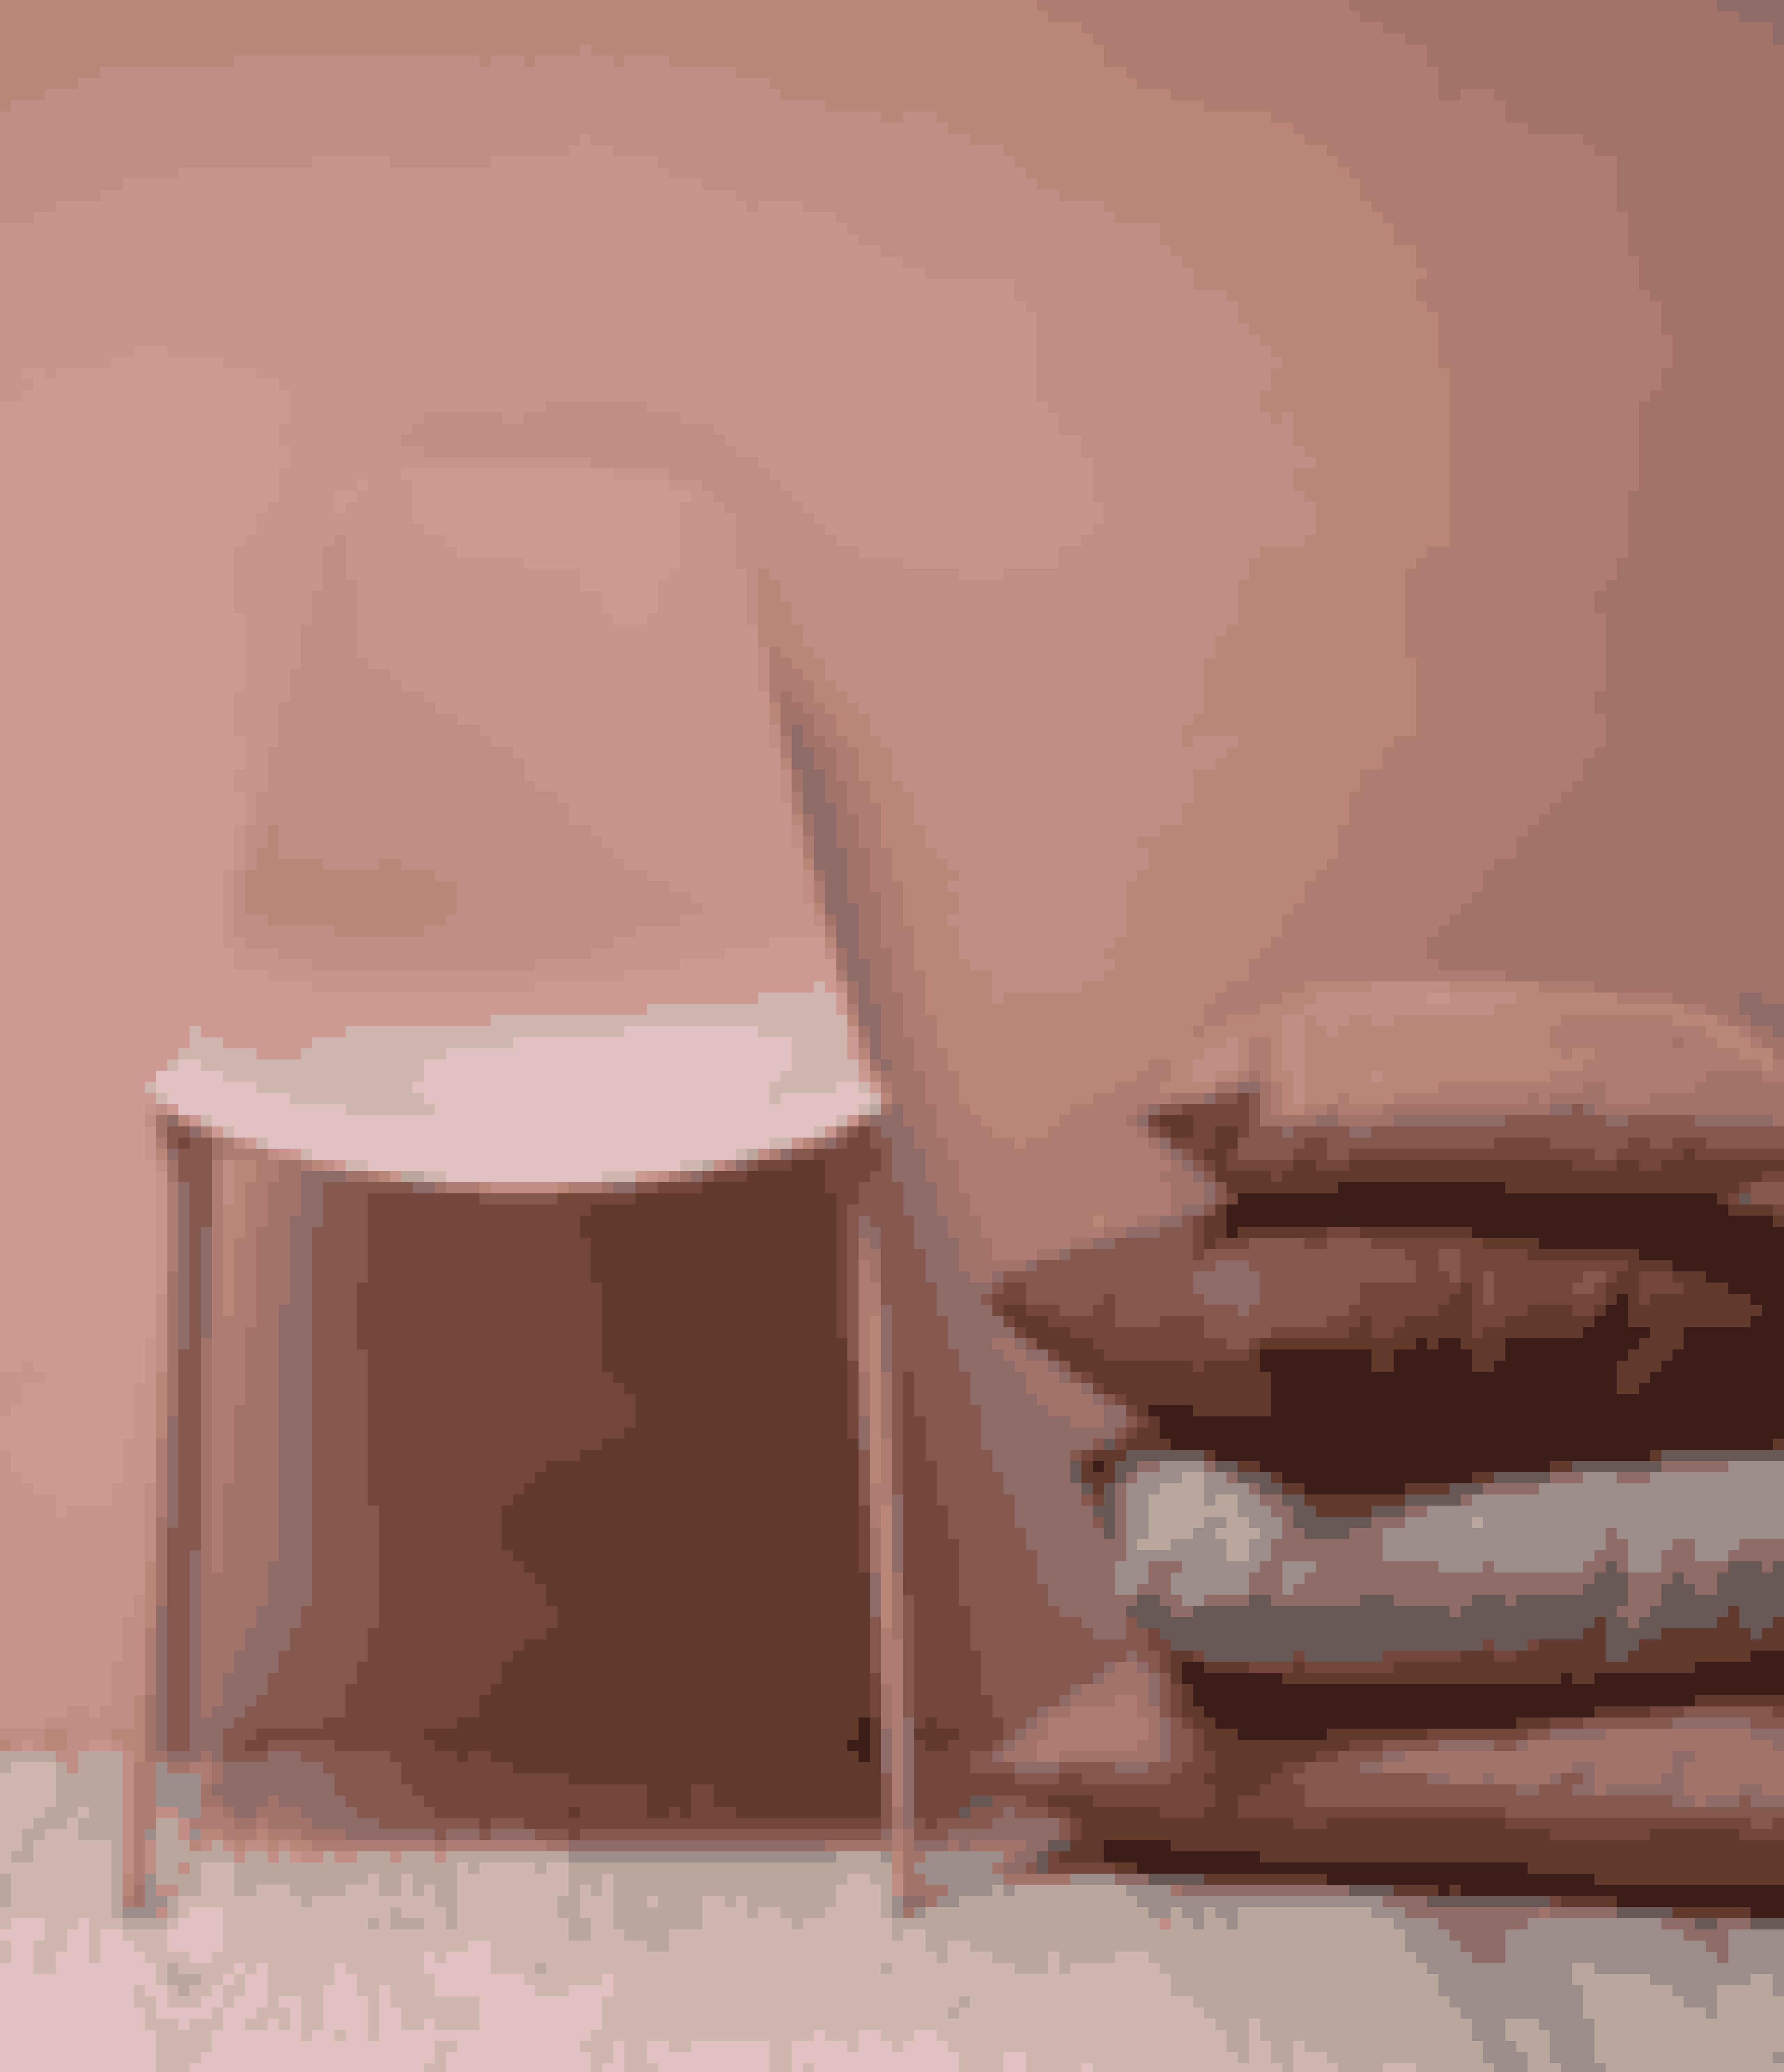 Stol, fås i seks farver, 298,00 kr.Pyntepude, fås i syv farver.45 x 45 cm,58,00 kr.